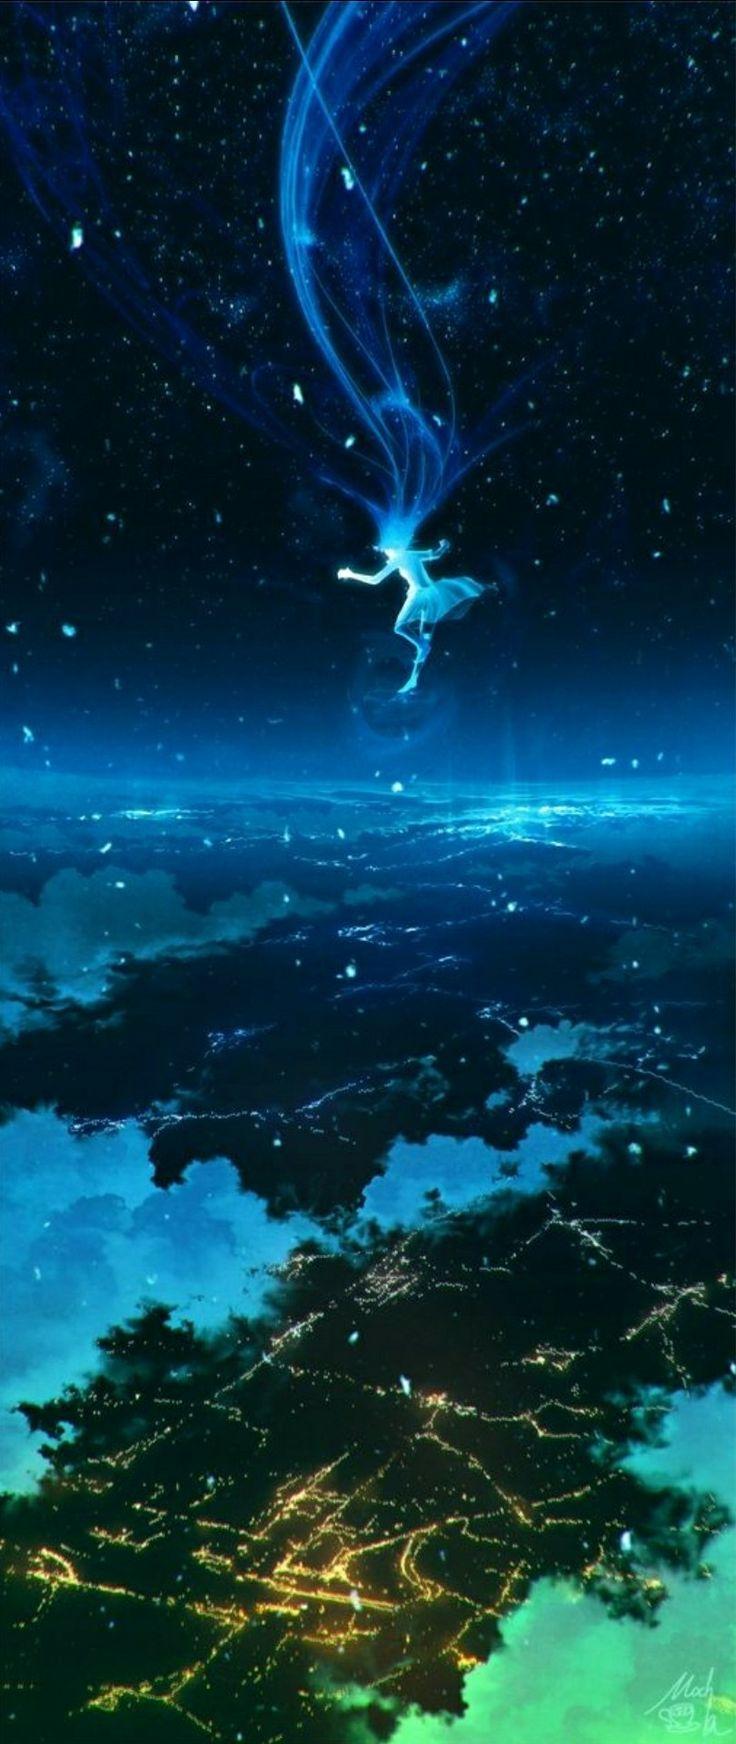 「Pemandangan anime」おしゃれまとめの人気アイデア|Pinterest|Kezya